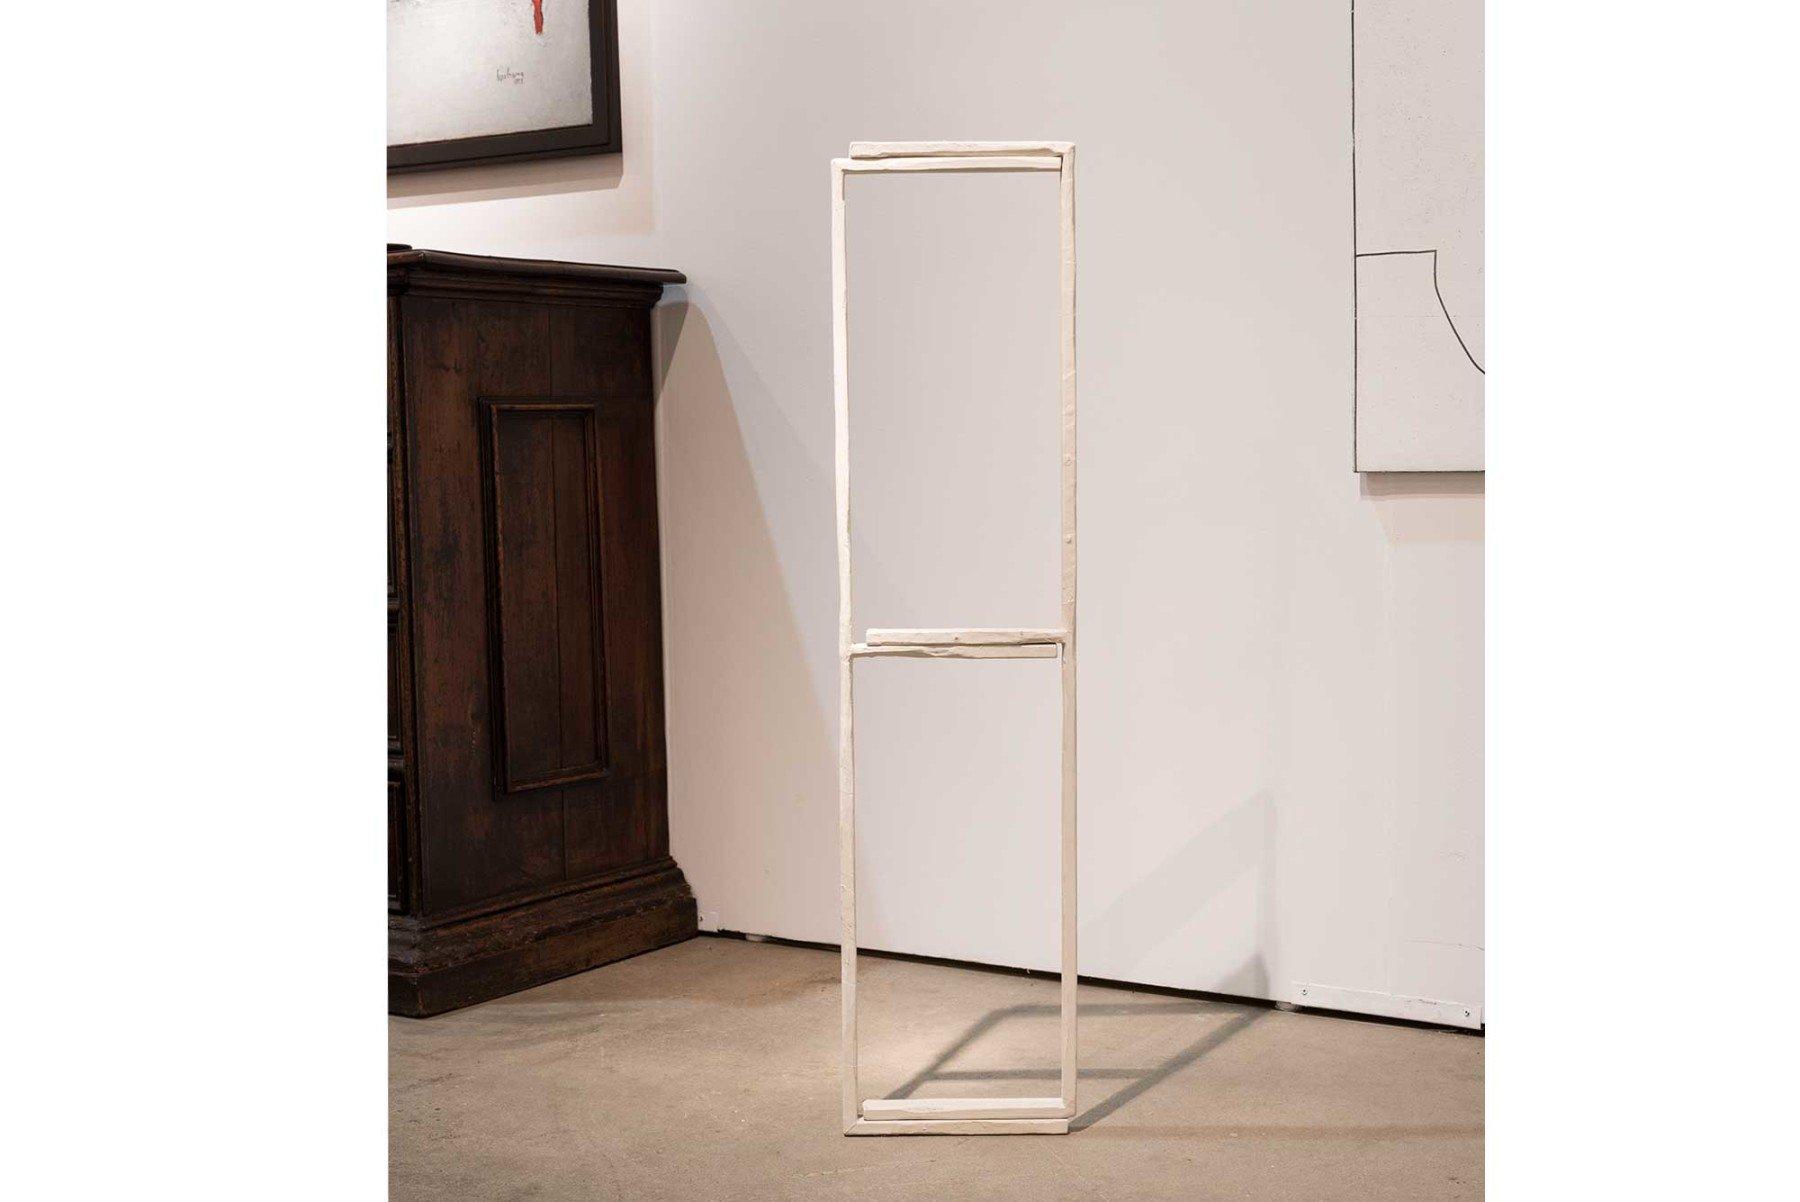 Clay Mahn                                Prop (E) - sculpture